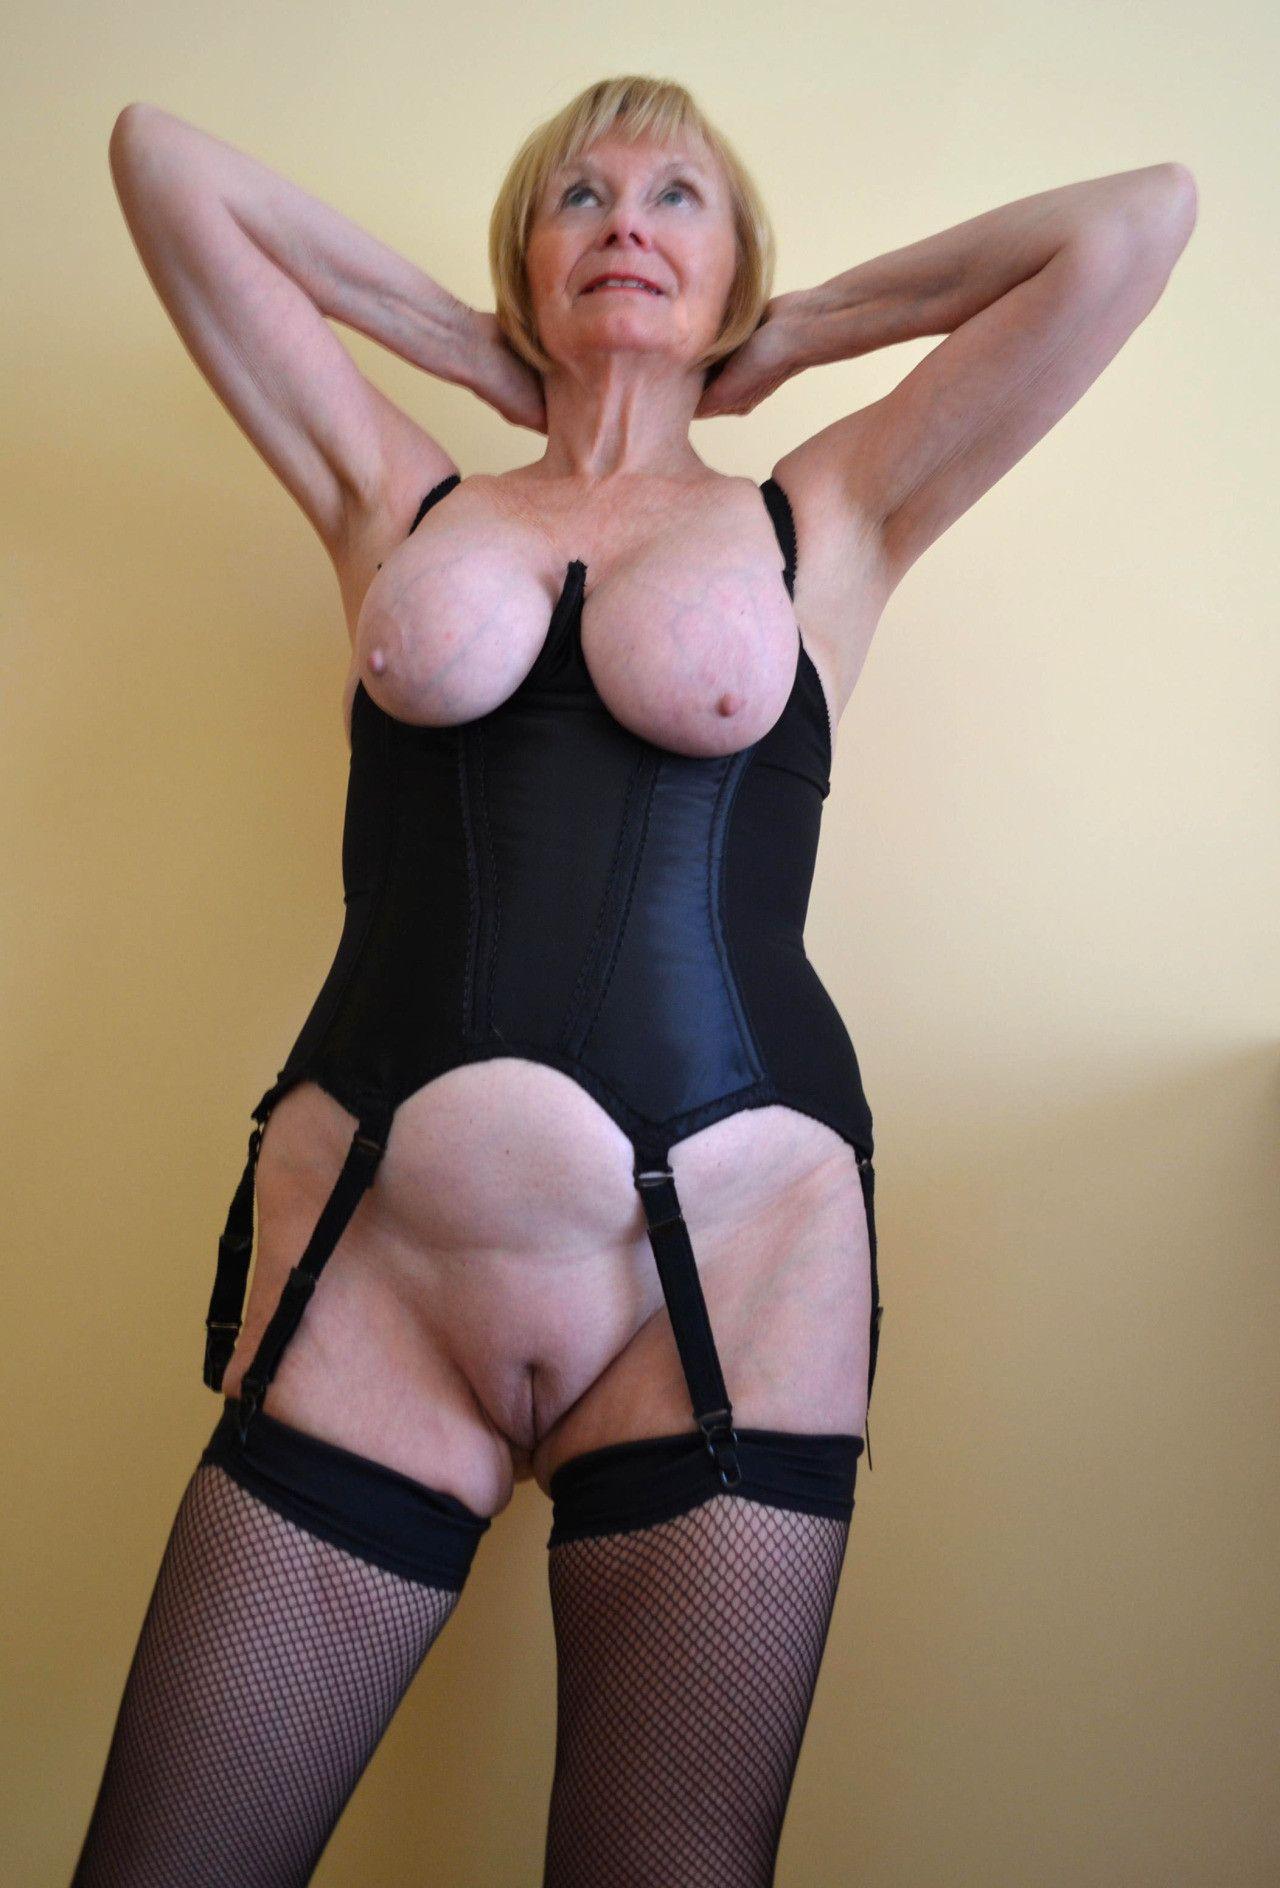 candid boob pic